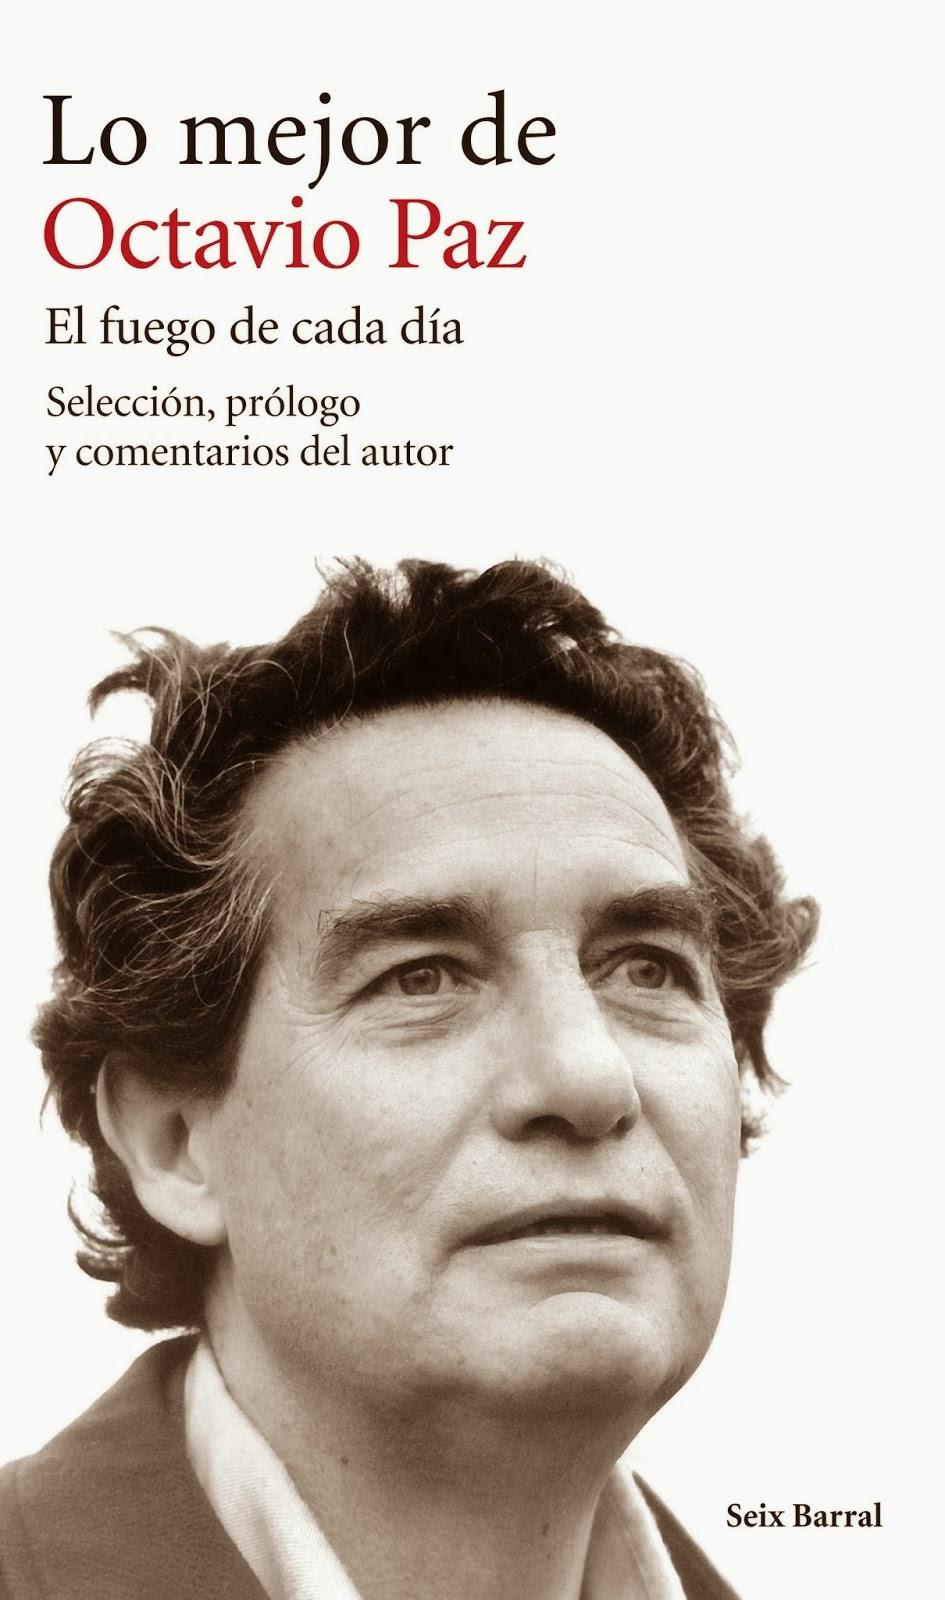 http://encuentrosconlasletras.blogspot.com.es/2014/11/octavio-paz-el-fuego-de-cada-dia.html